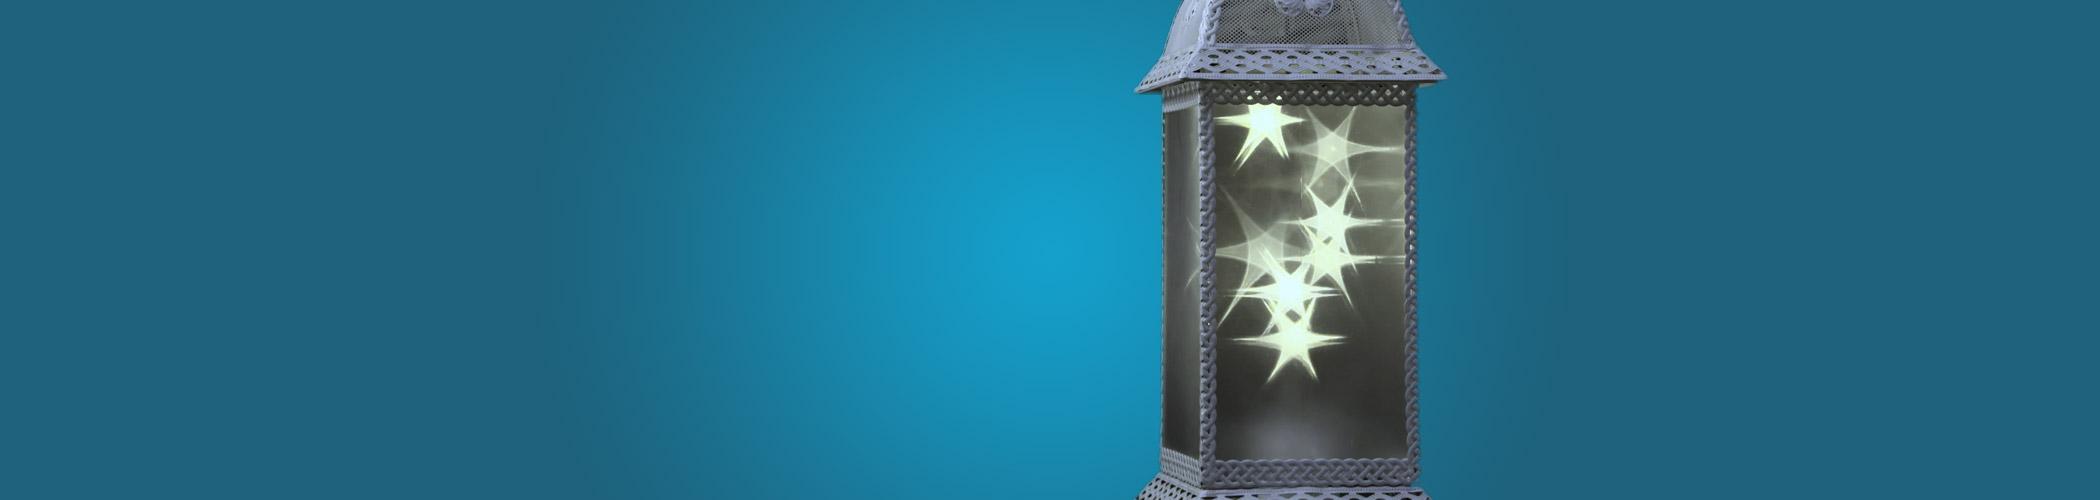 Turning Ice Lanterns - Our Turning Ice Lanterns rotate, creating a wonderful lighting effect. We have two ranges, the pyramid and ice lanterns.#View Range